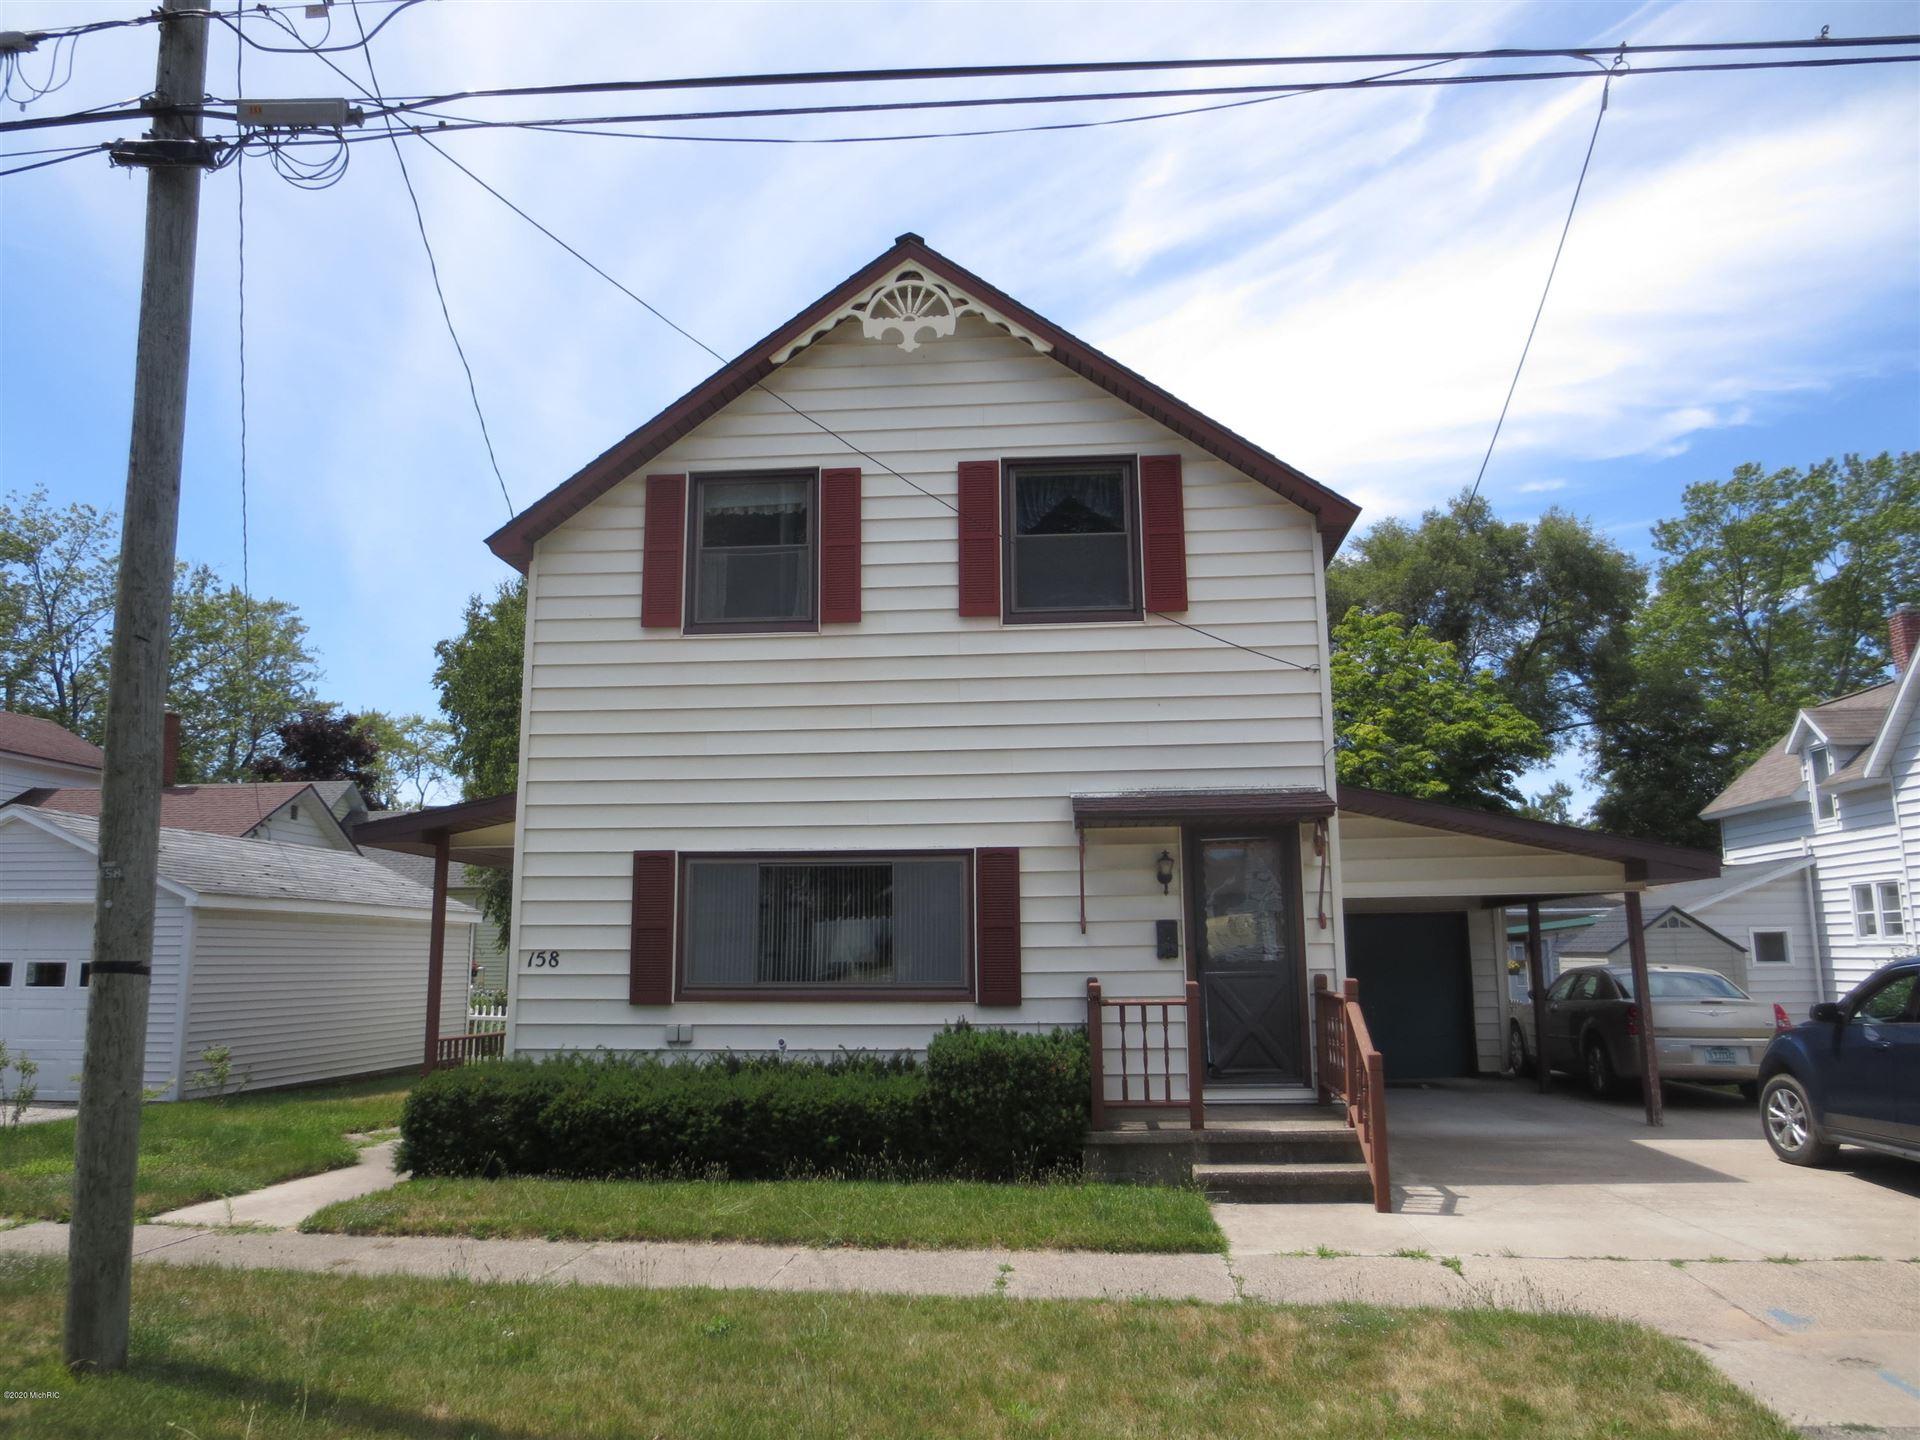 158 Ford Street, Manistee, MI 49660 - MLS#: 20029022